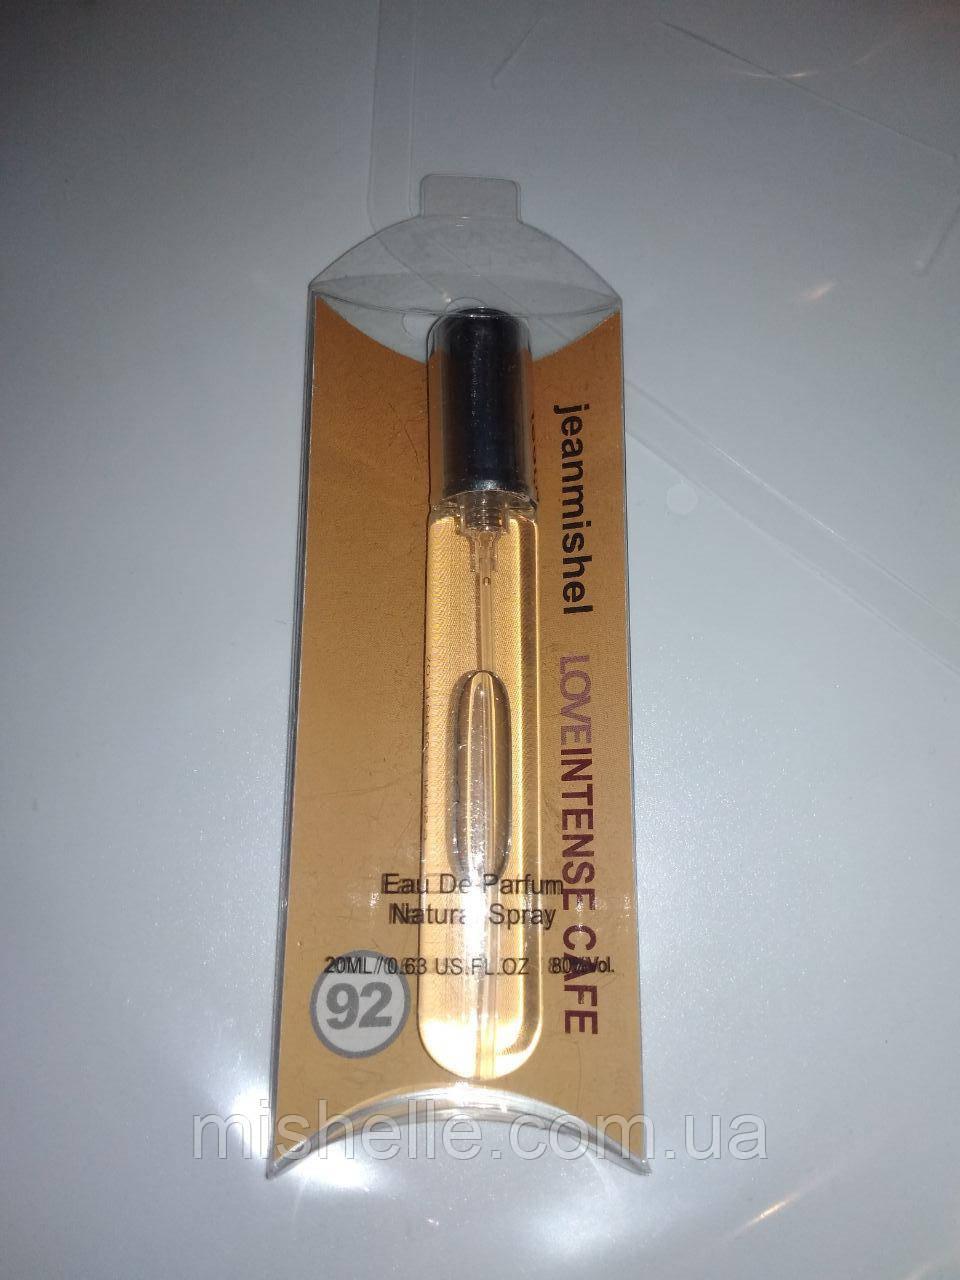 Міні парфум jeanmishel Love Montale Intense Cafe 20мл